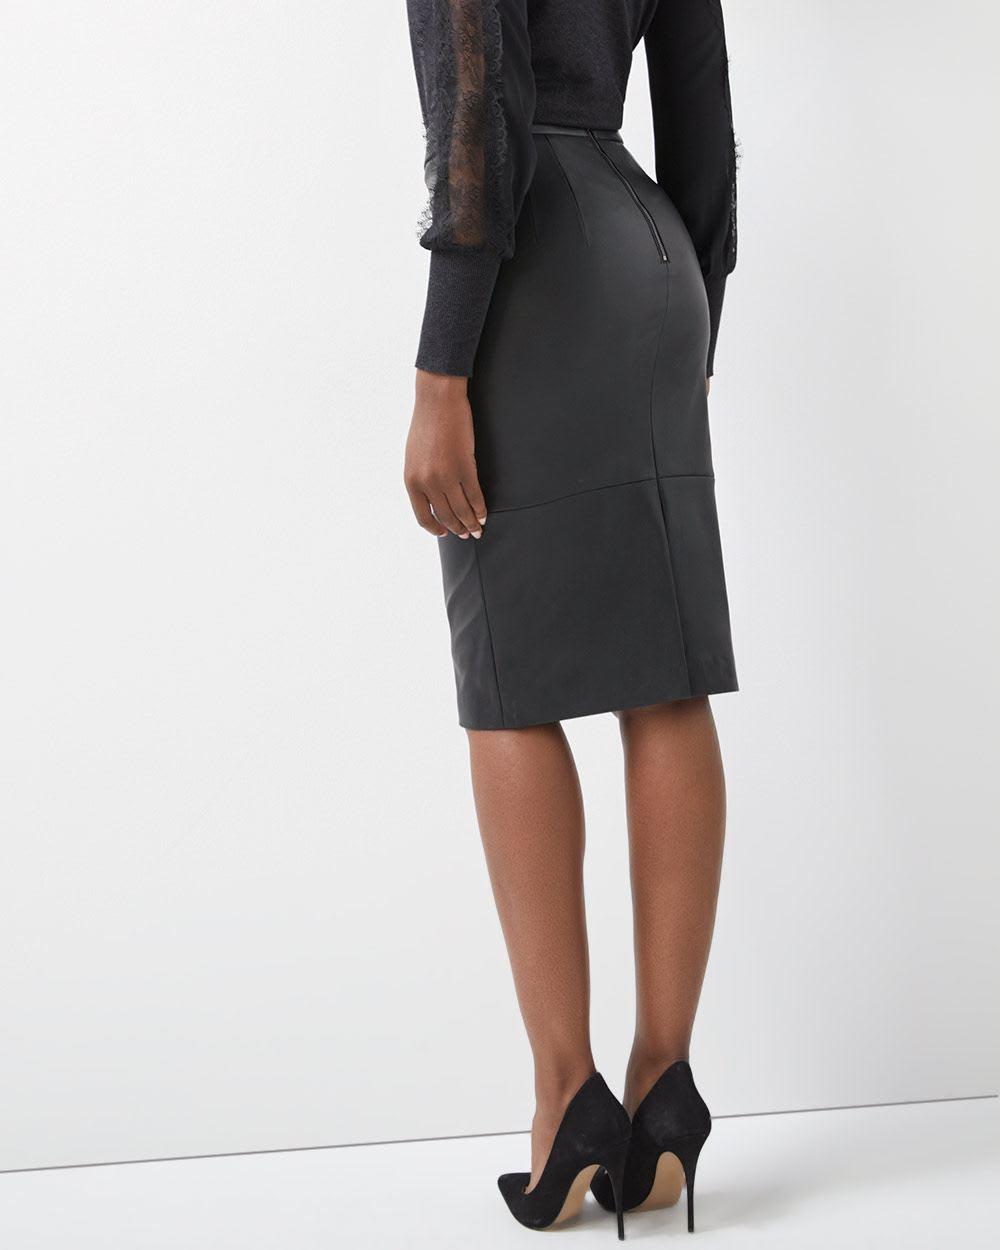 84aaec637f High-Waist Faux leather pencil skirt | RW&CO.